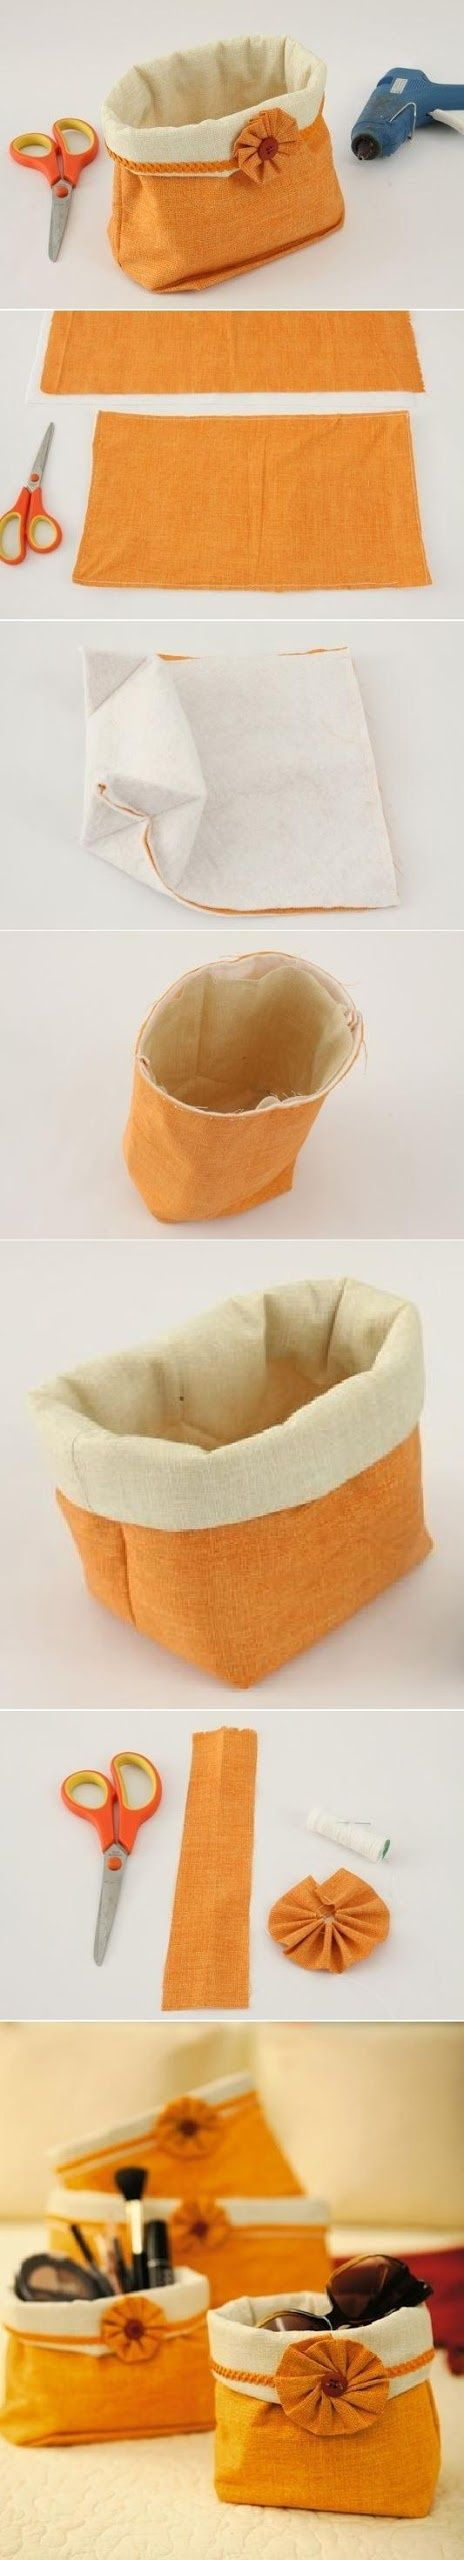 Make a Charming Catch All Bag